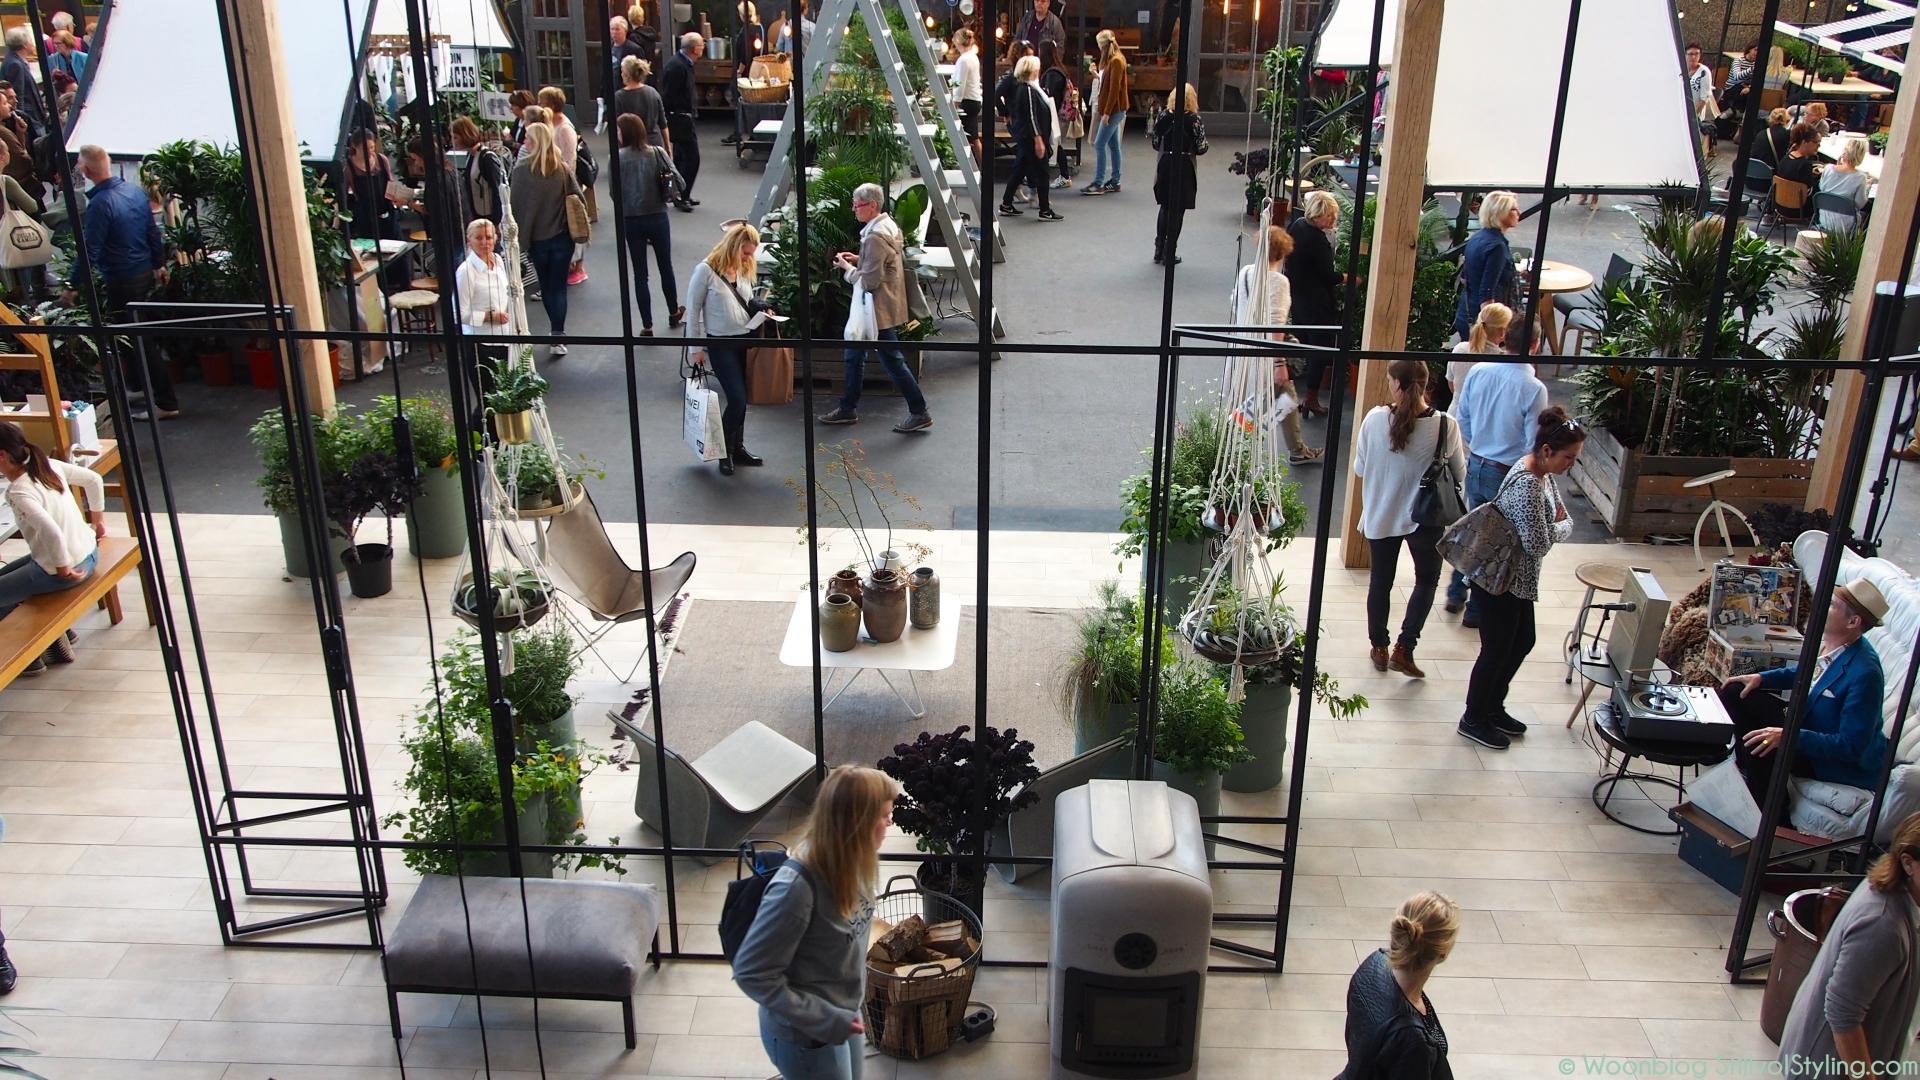 Woonnieuws vt wonen design beurs stijlvol styling for Interieur beurs